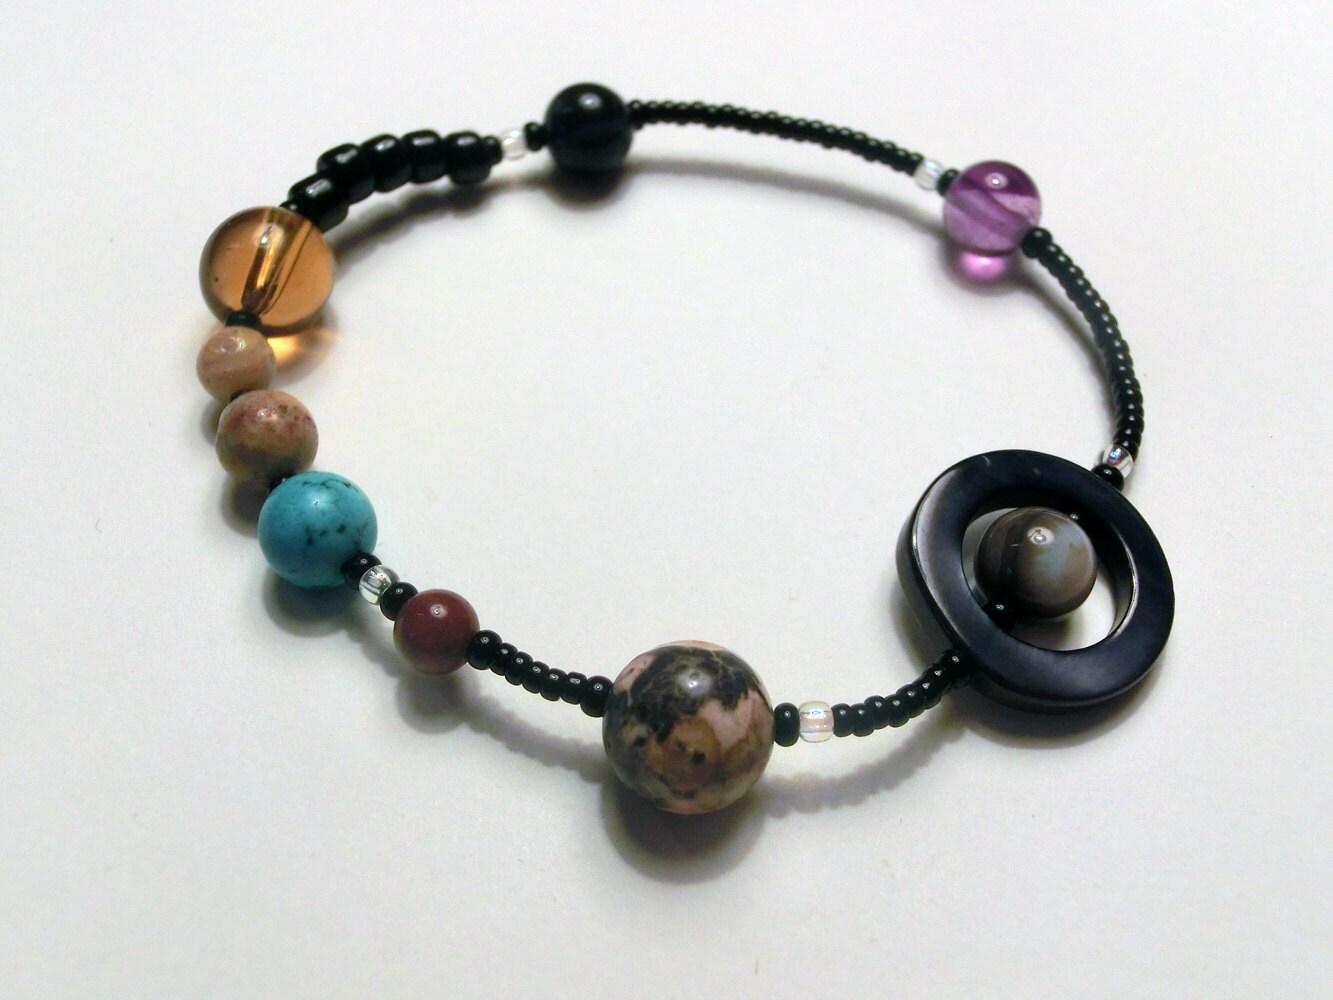 solar system bracelet - photo #33